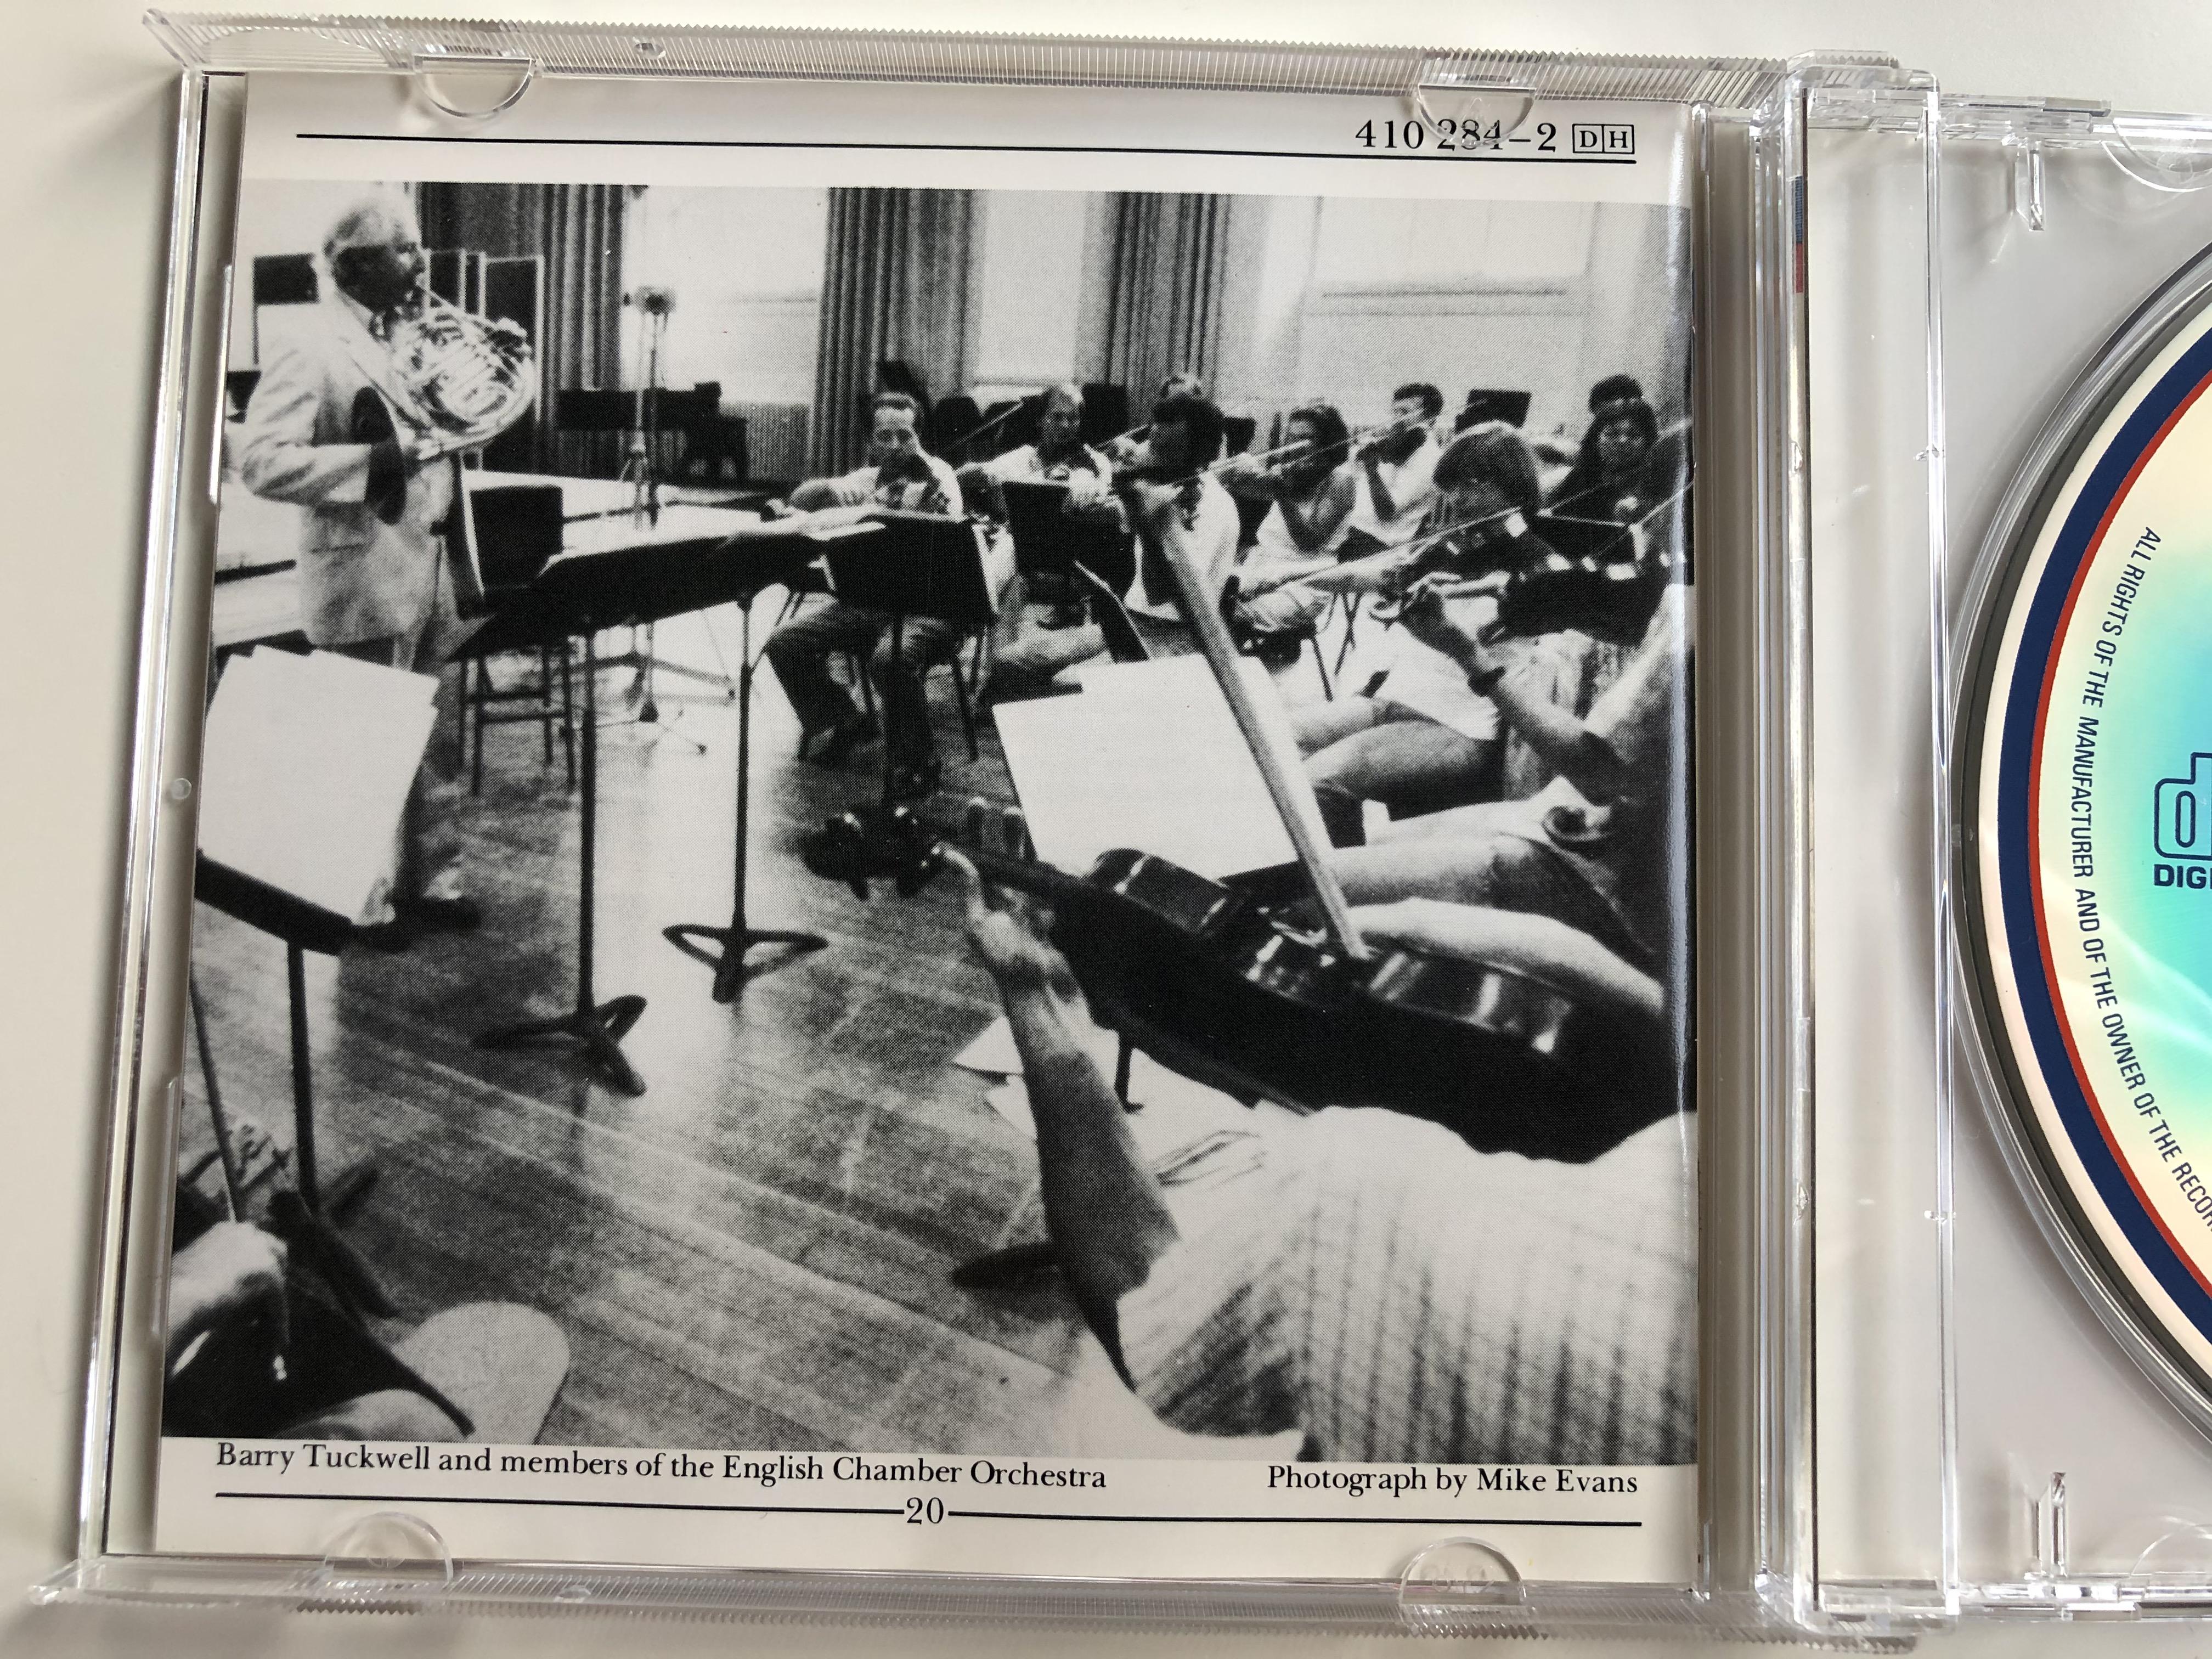 mozart-horn-concertos-concertos-pour-cor-hornkonzerte-nos.-1-4-barry-tuckwell-english-chamber-orchestra-decca-audio-cd-1984-stereo-410-284-2-6-.jpg